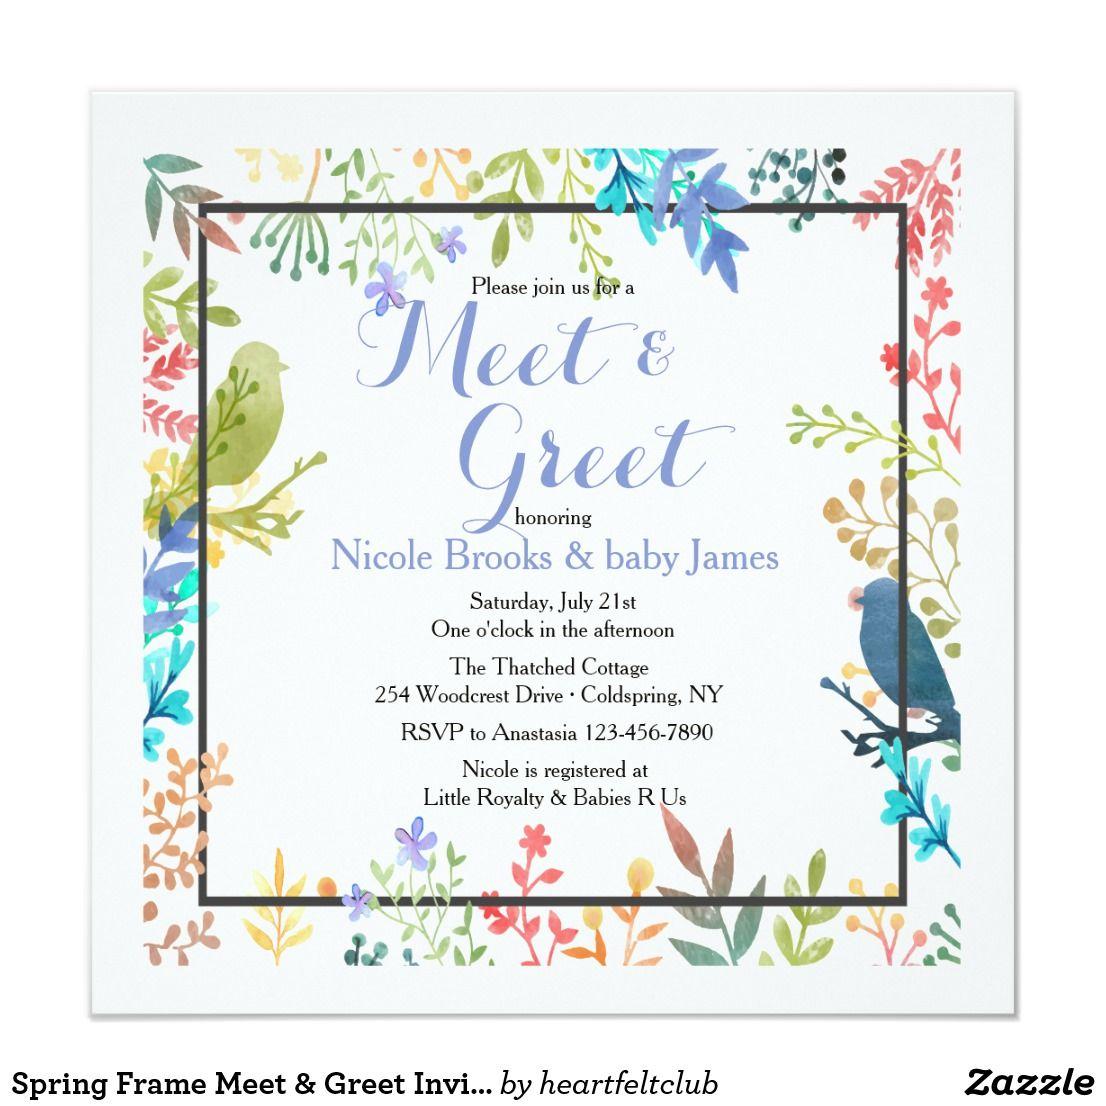 Spring Frame Meet & Greet Invitation | Zazzle.com | Invitations, Custom  baby shower invitations, Invitation template